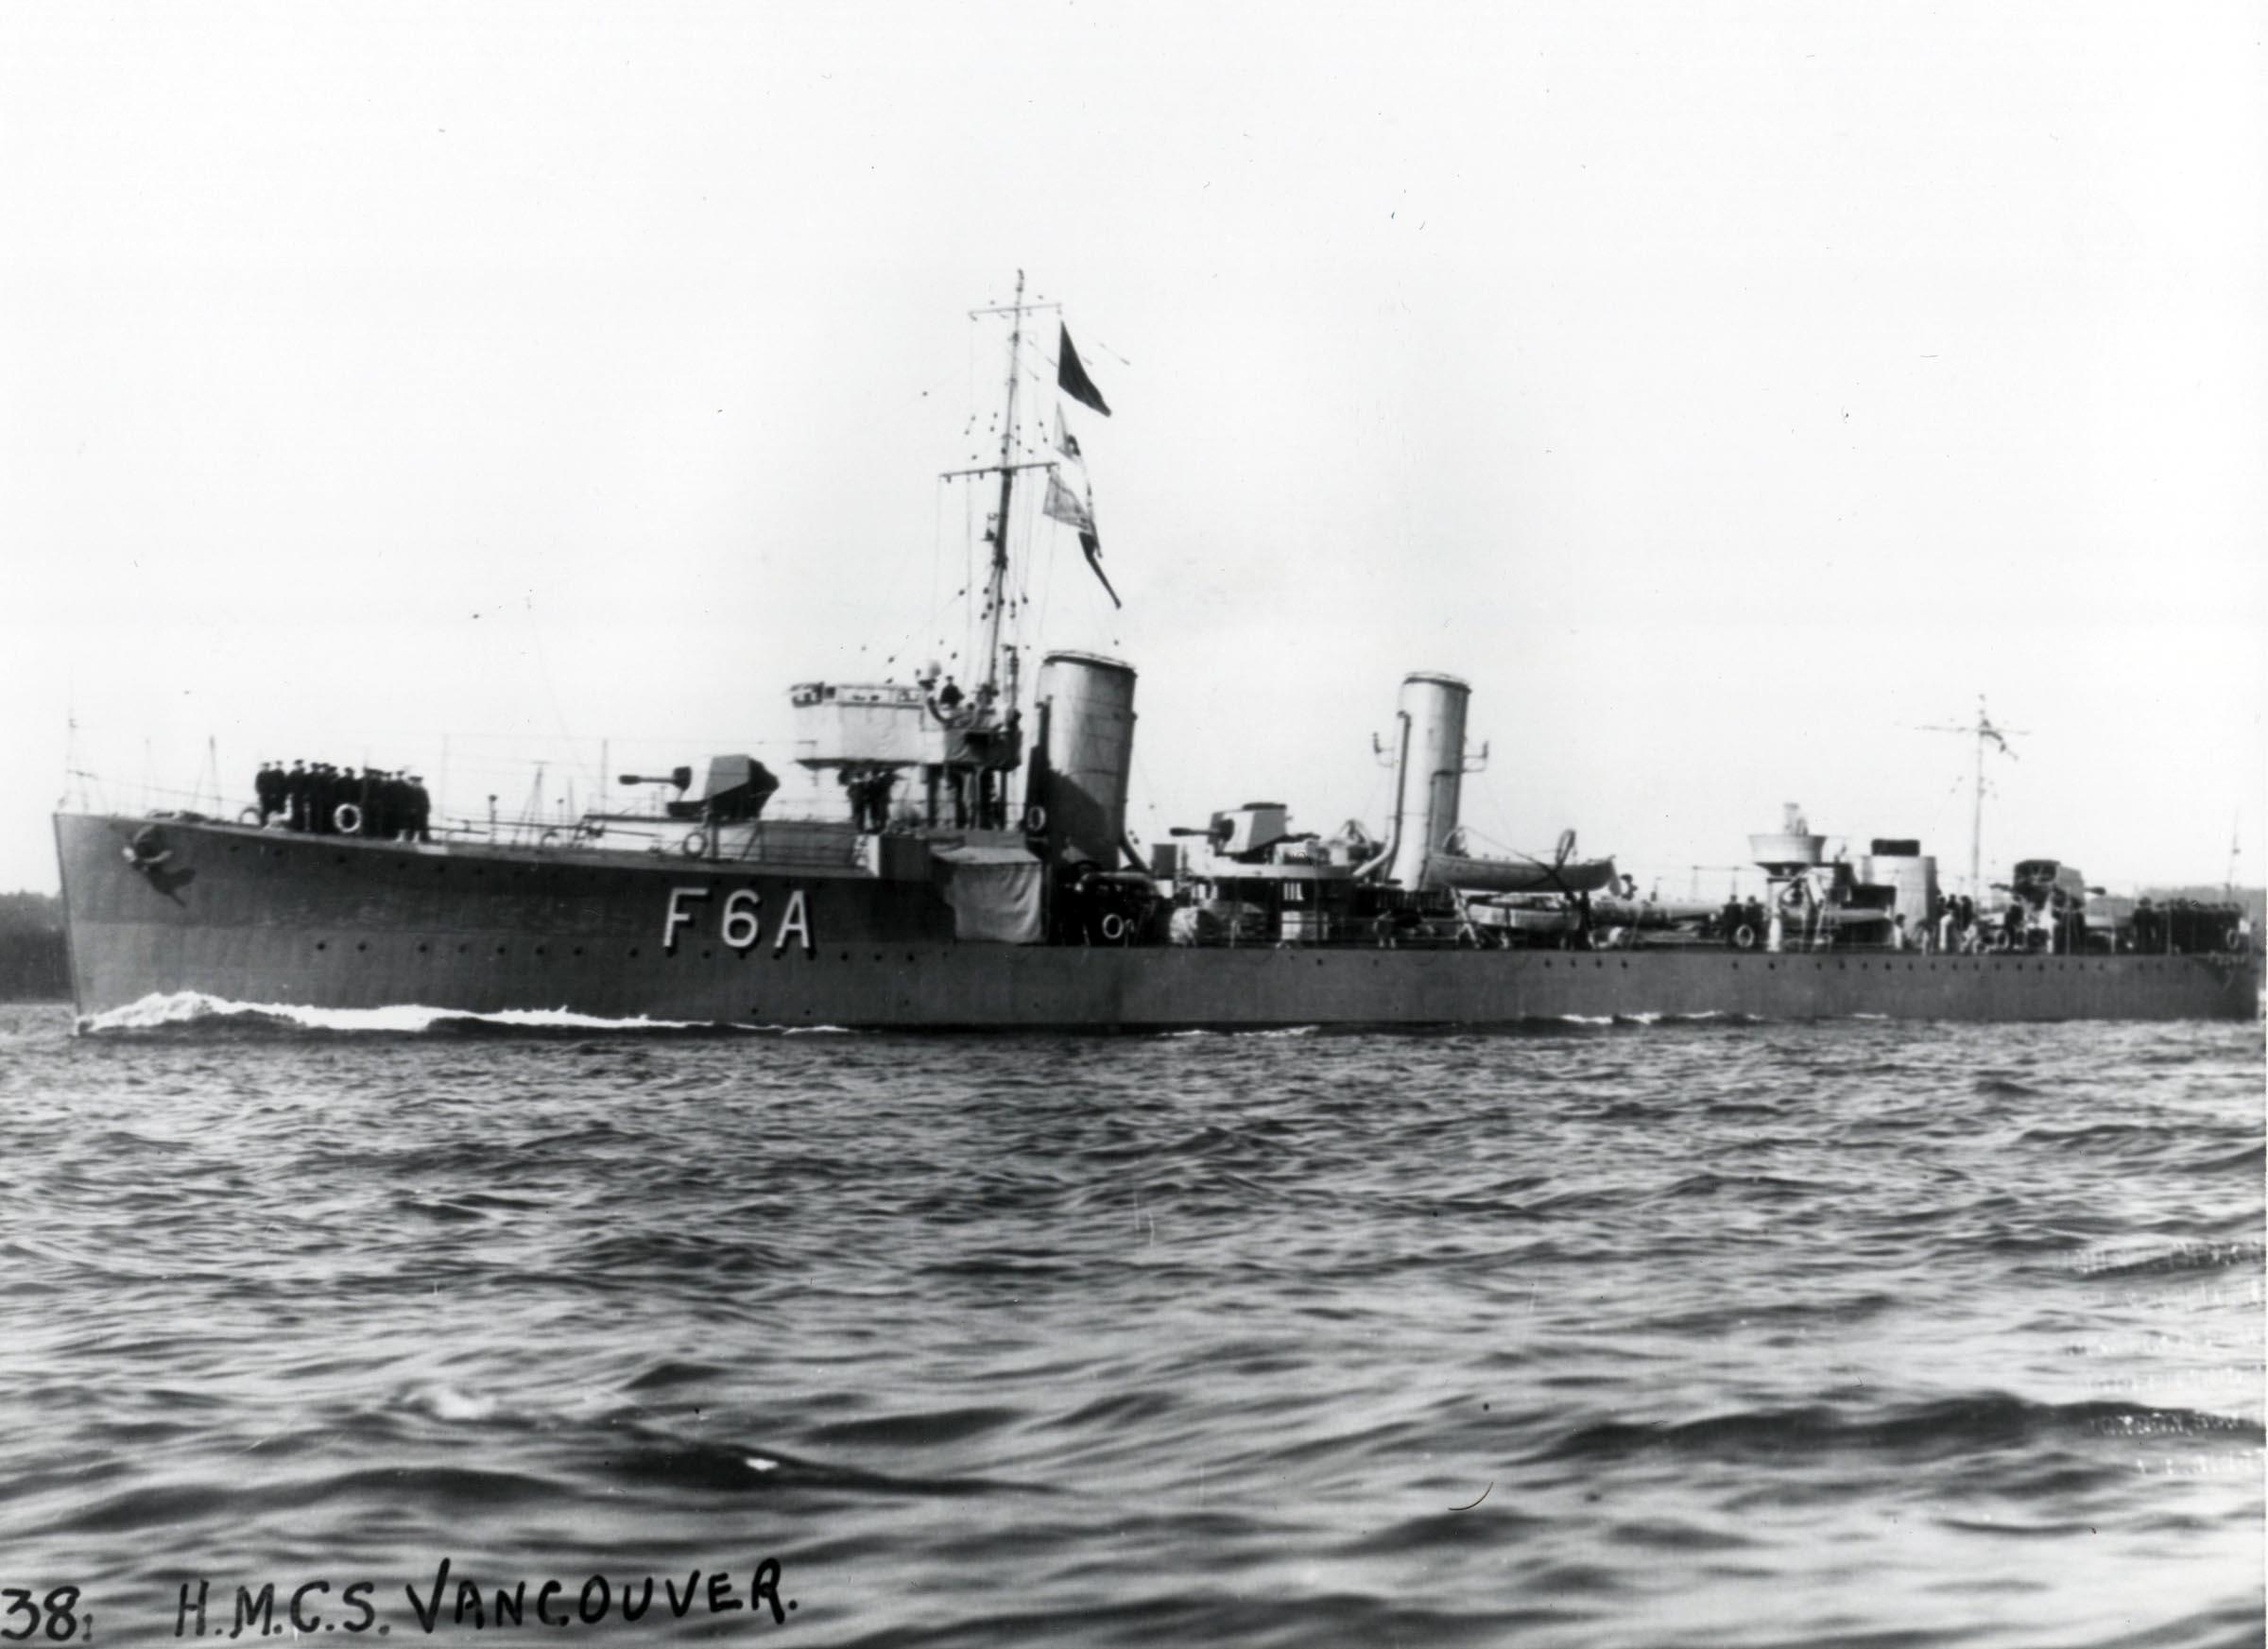 HMCS VANCOUVER (1st)